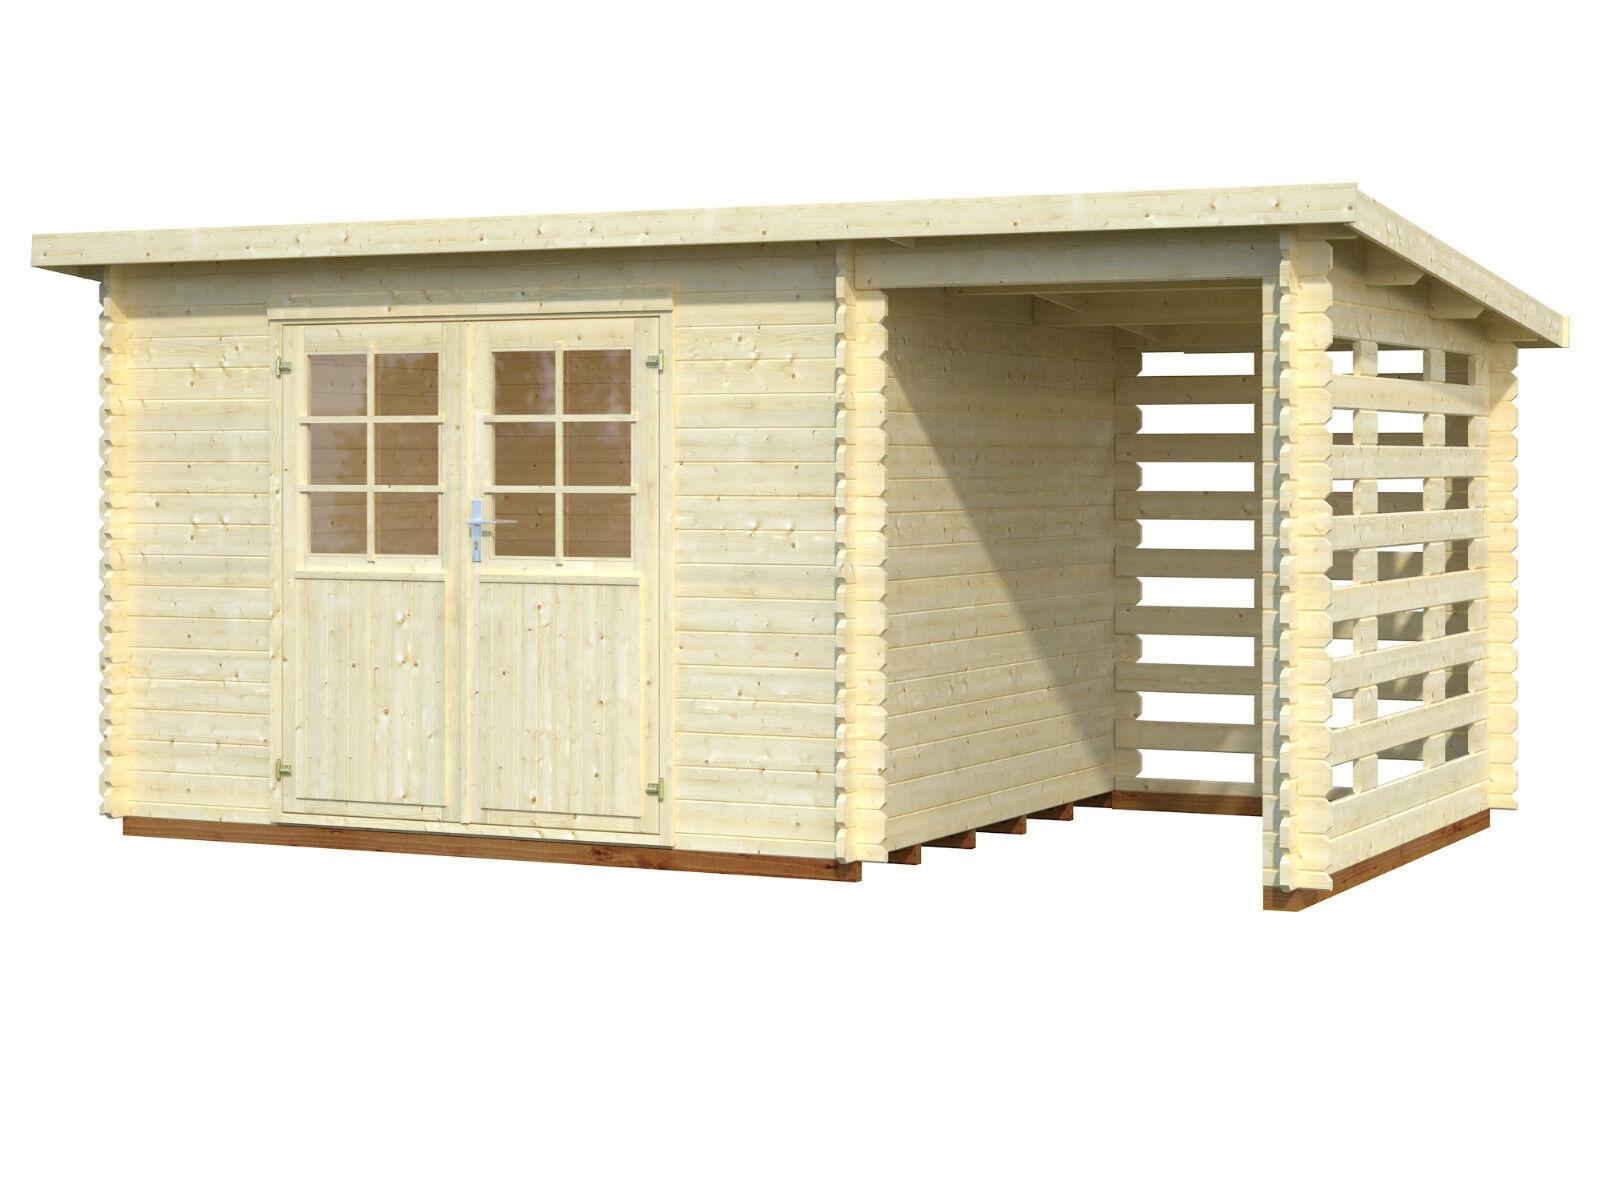 28 mm gartenhaus anbau ger tehaus pultdachhaus schuppen. Black Bedroom Furniture Sets. Home Design Ideas